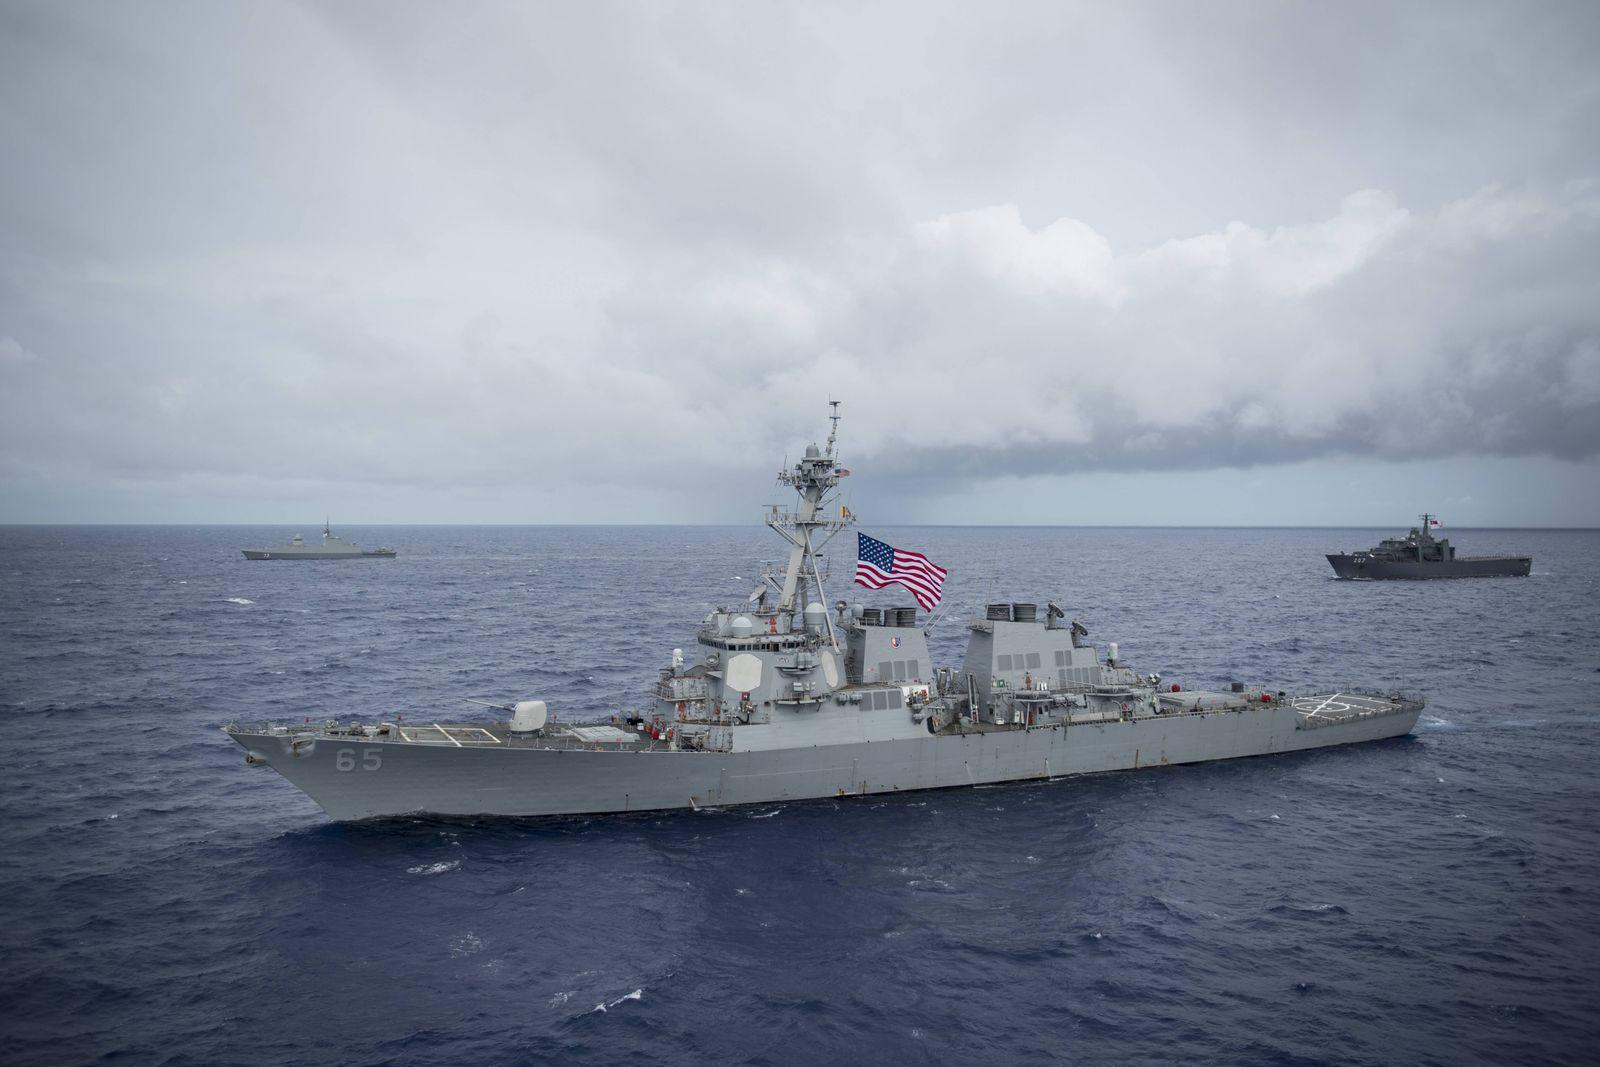 August 28, 2017 - Guam - The U.S. Navy Arleigh Burke-class guided-missile destroyer USS Benfold stea